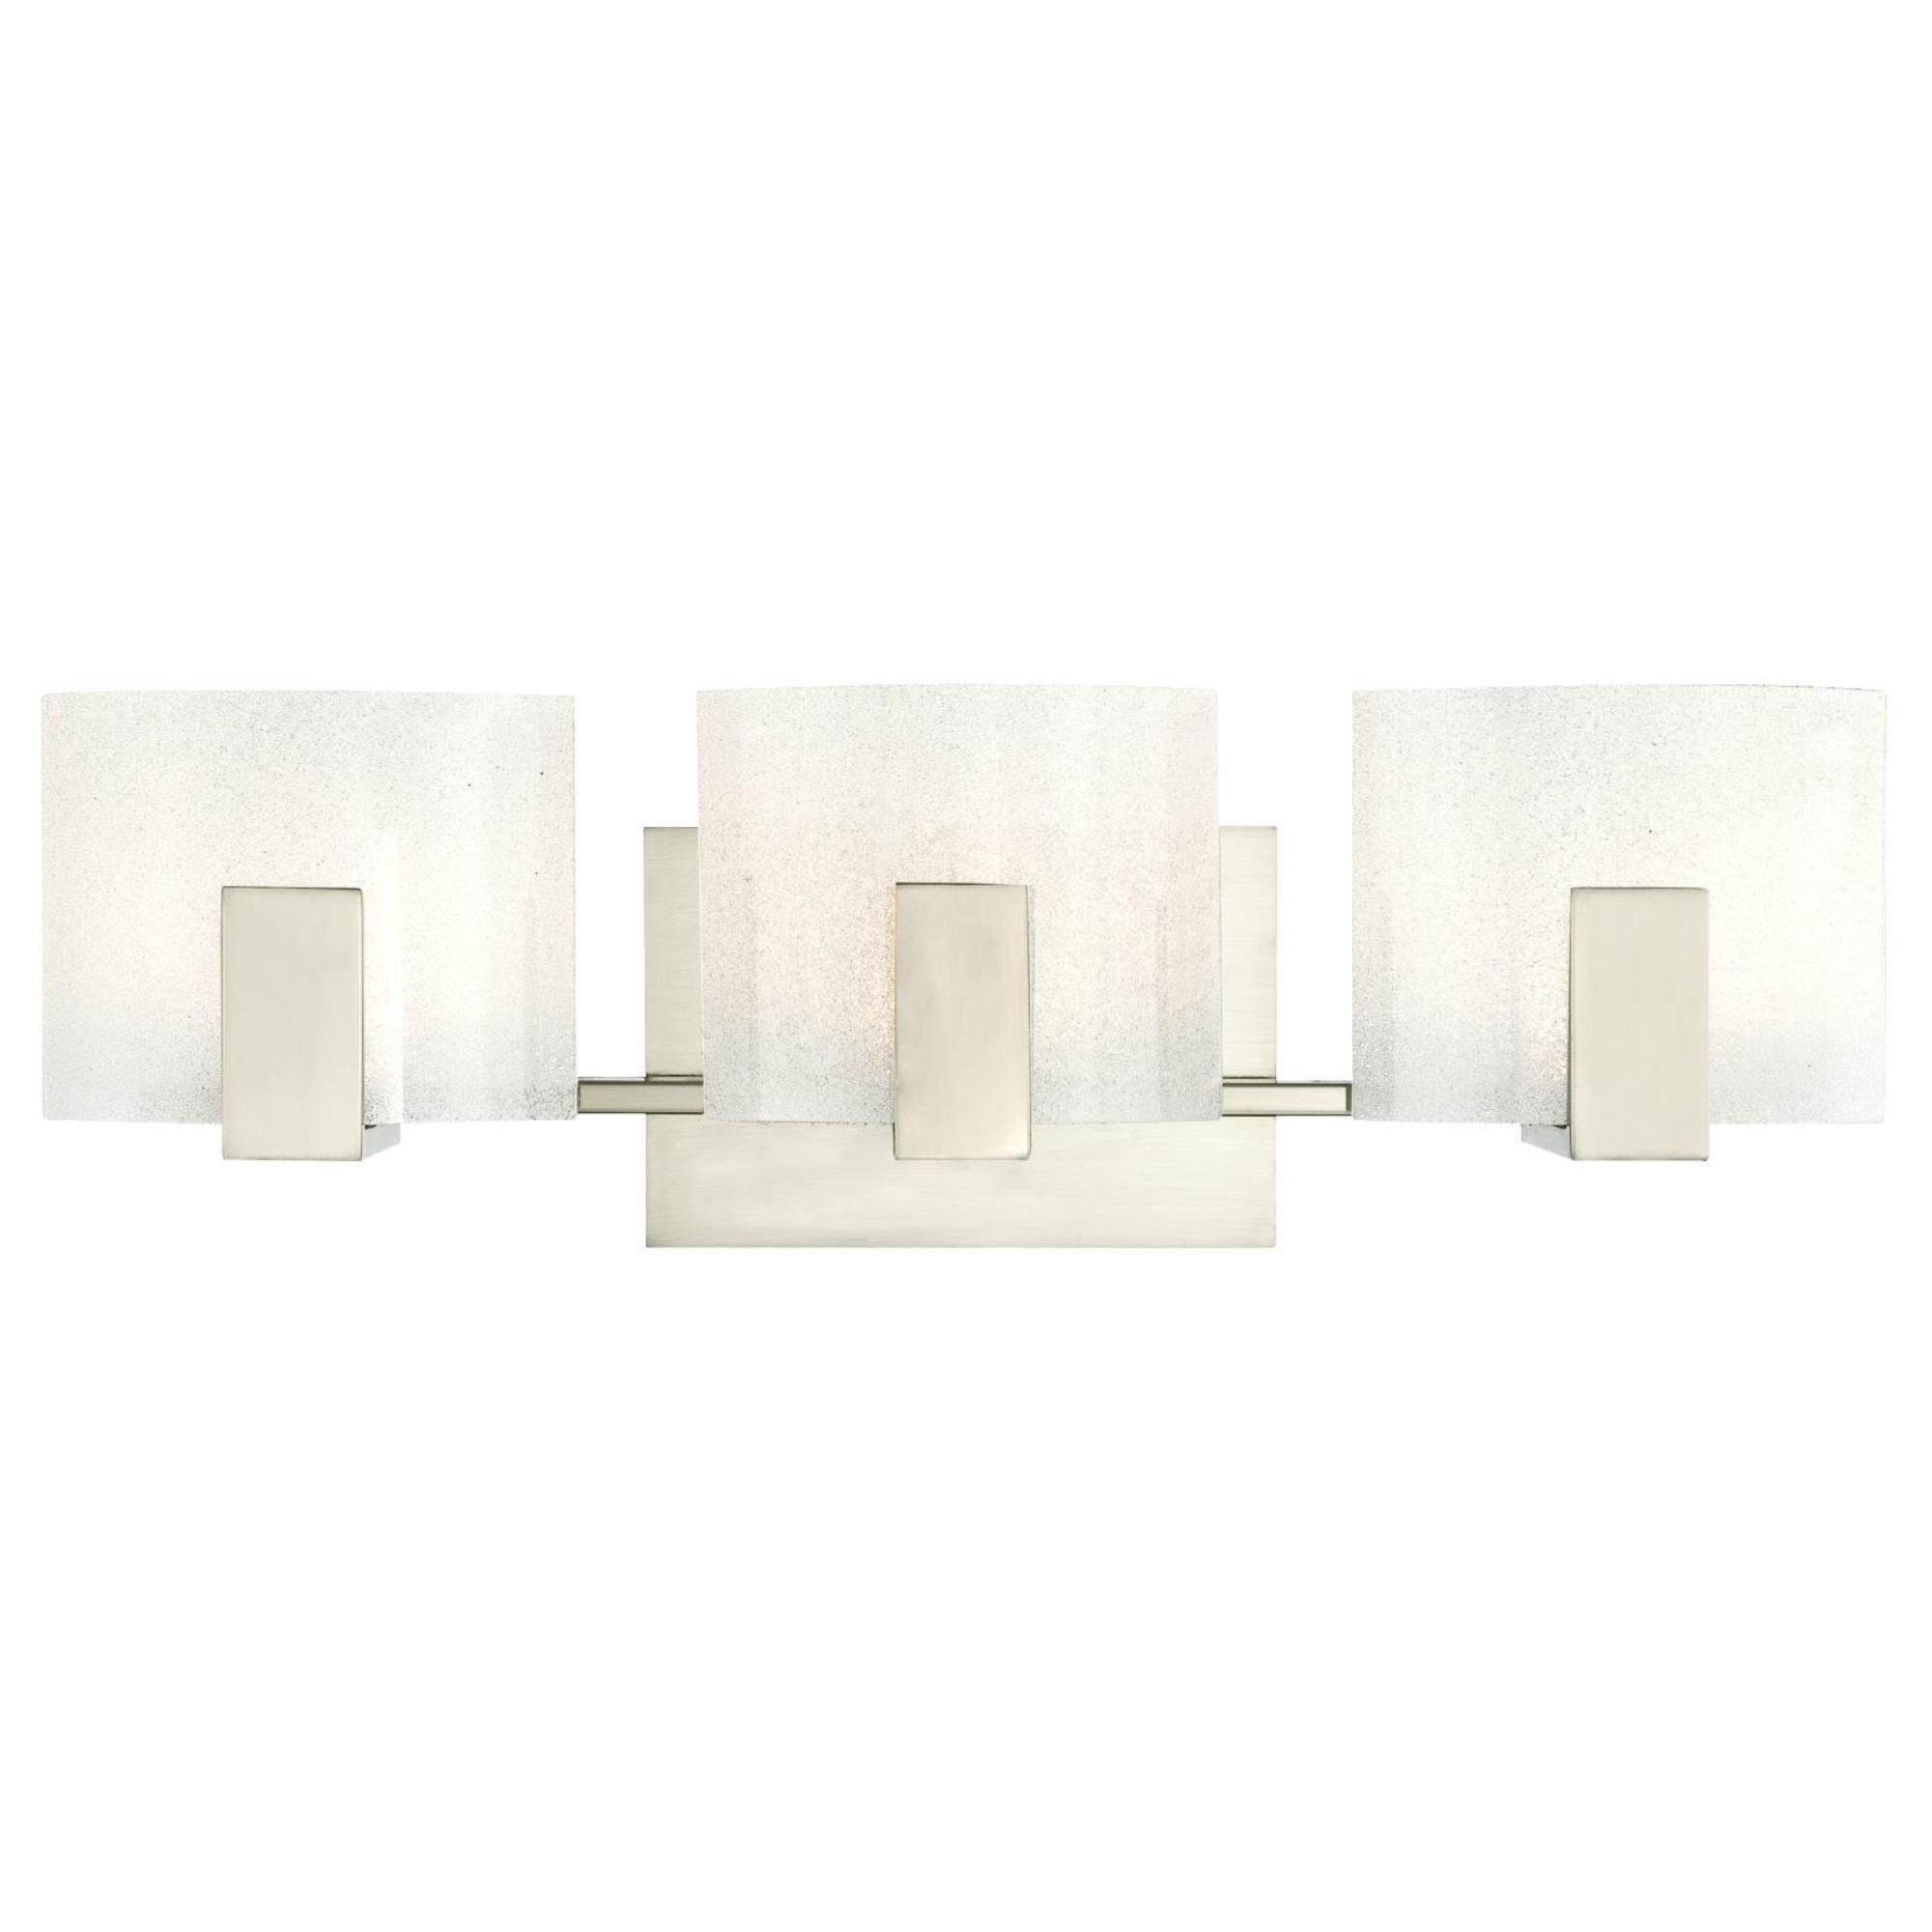 Westinghouse 6330000 Zaya Three-Light LED Indoor Wall Fixture, Brushed Nickel Finish with Sparkle Glass